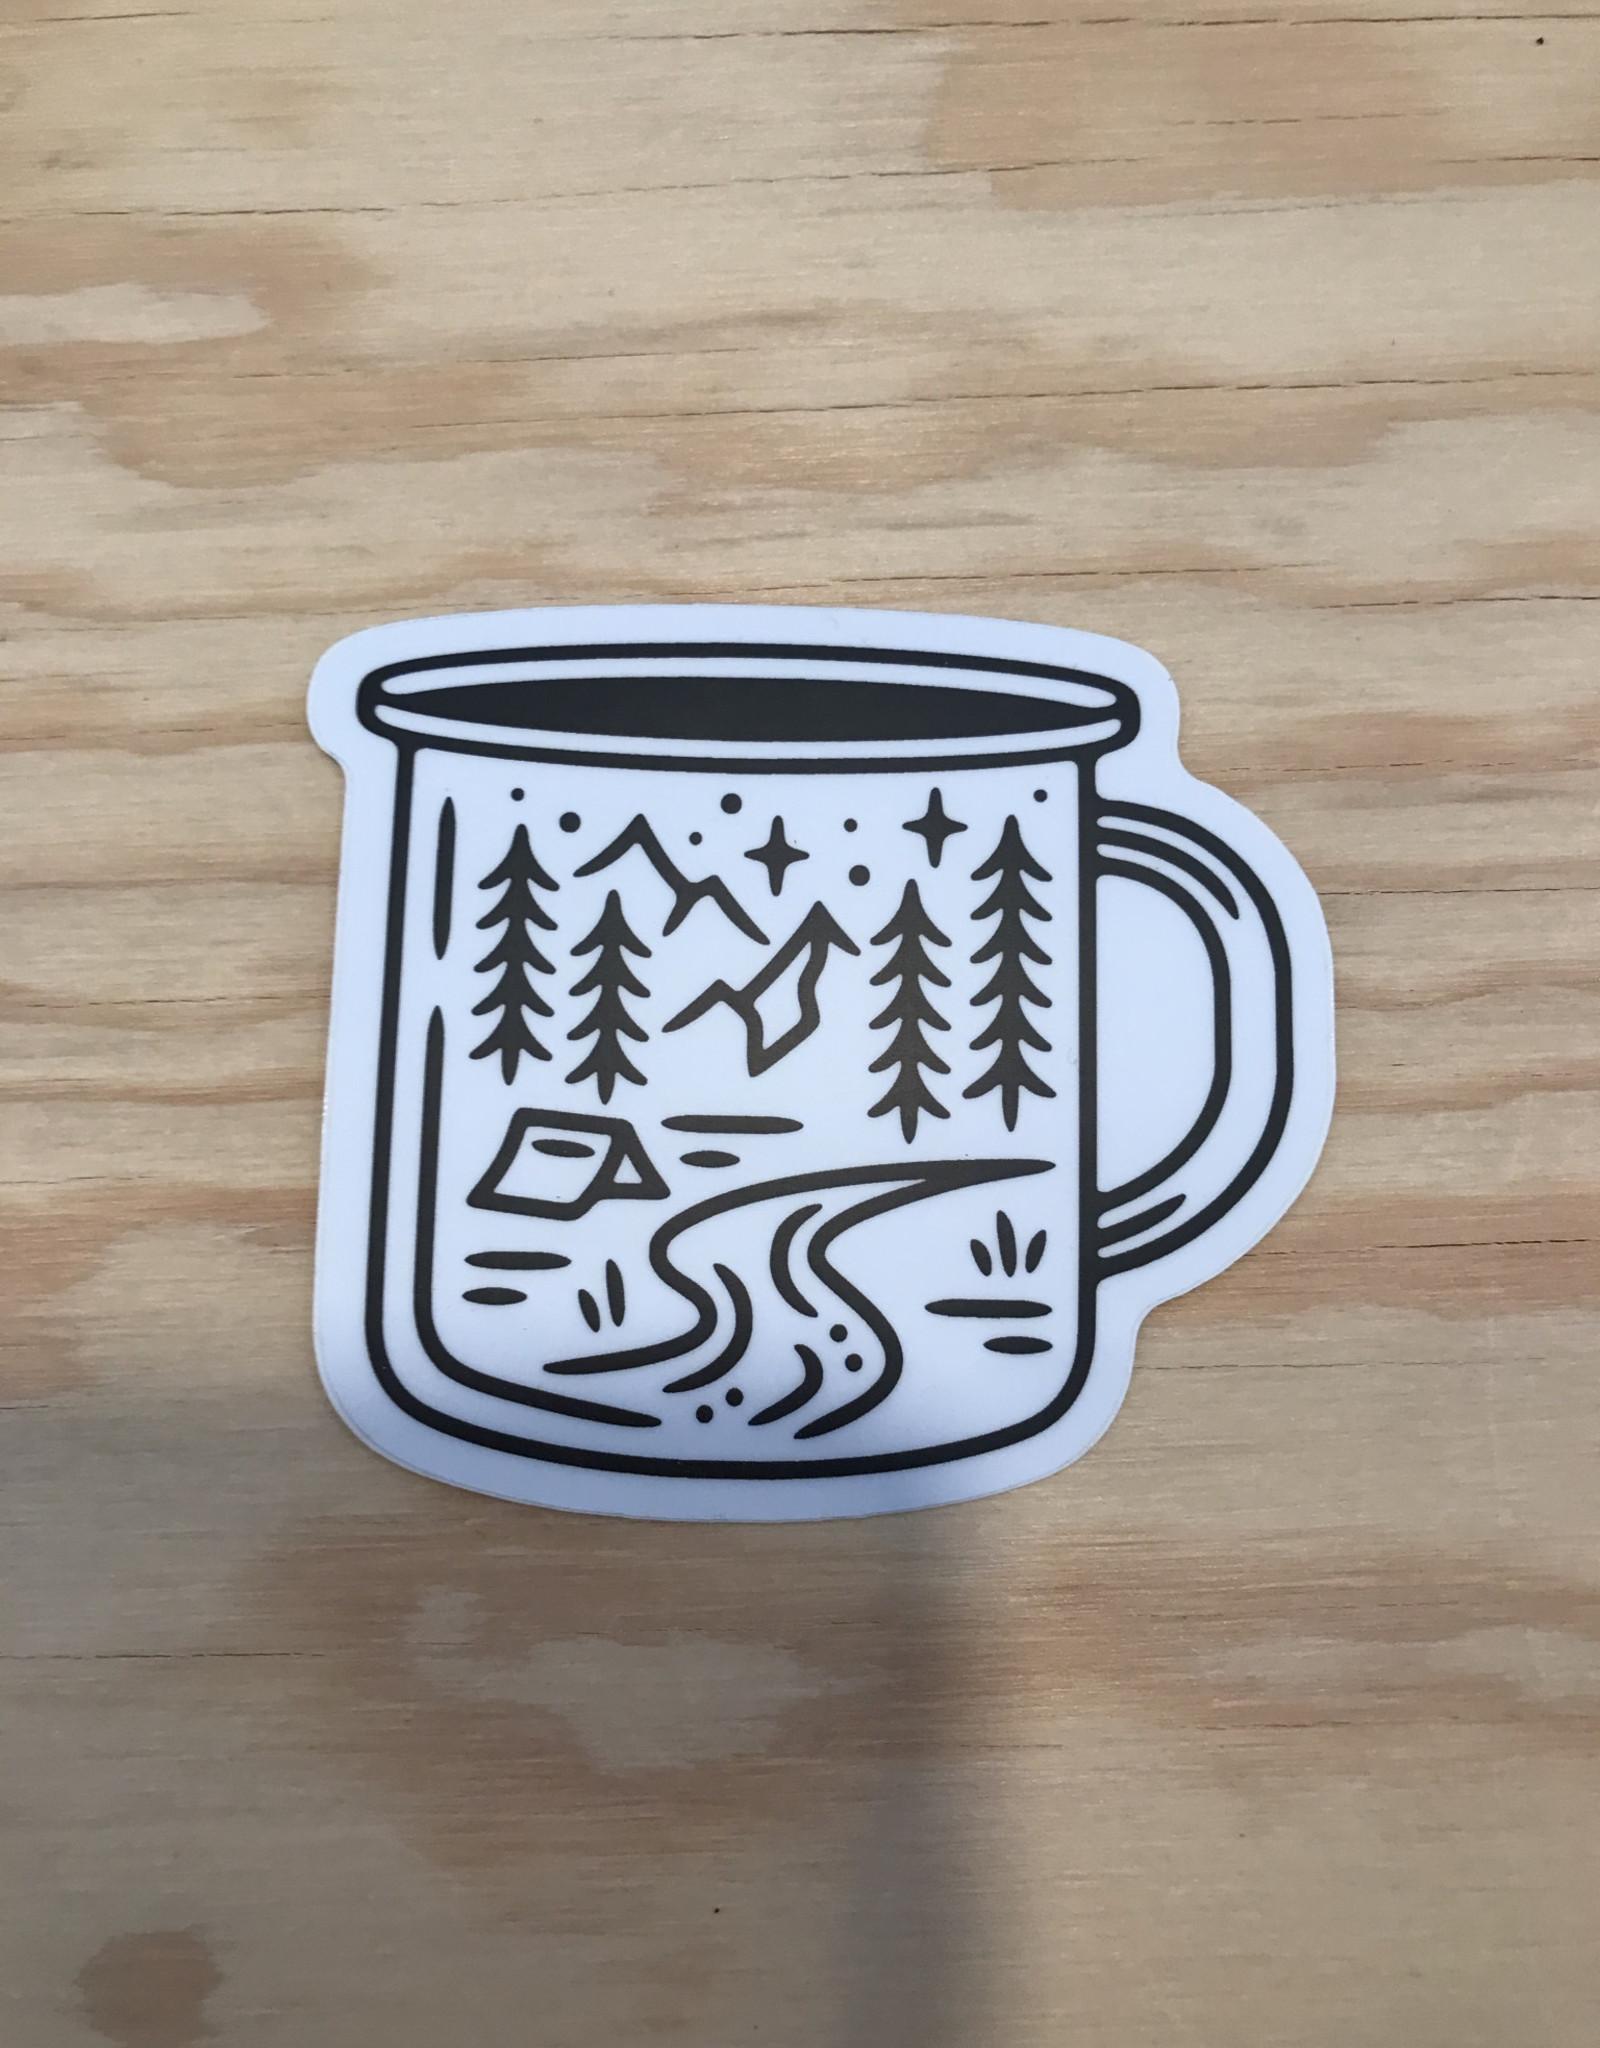 Stickers Northwest Sticker- Camping Mug Scene